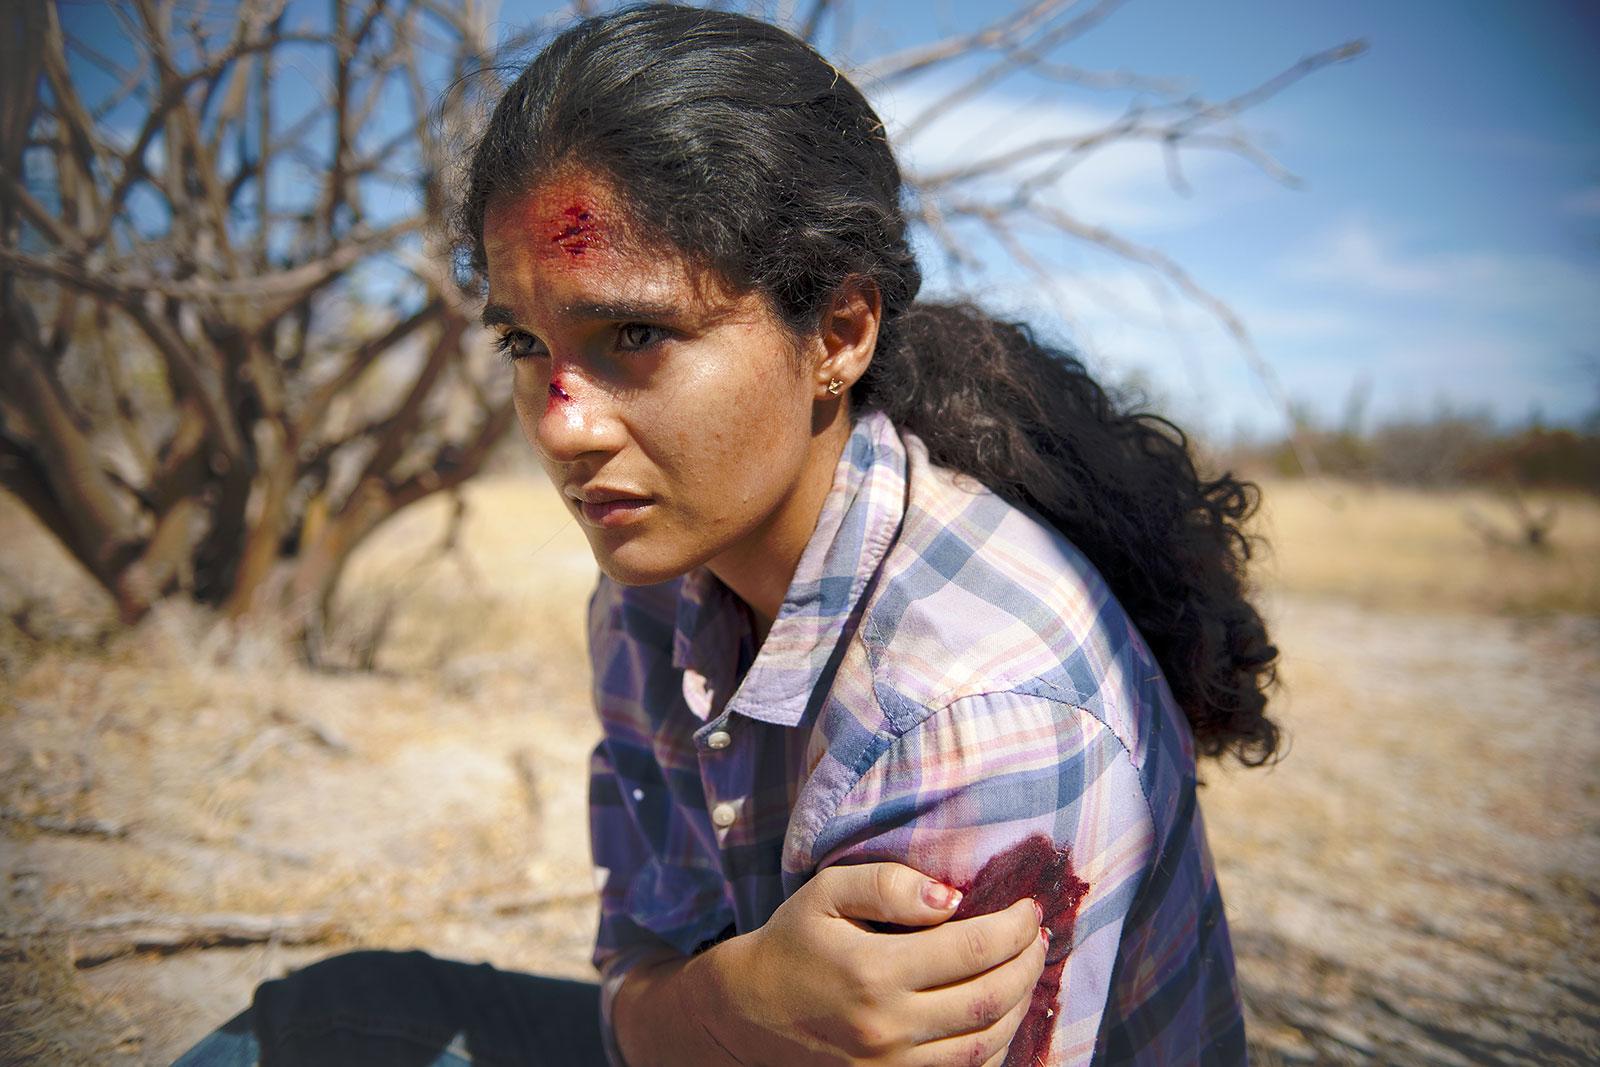 DESIERTO - Image 3 film Jonas Cuaron 2016 - Go with the Blog